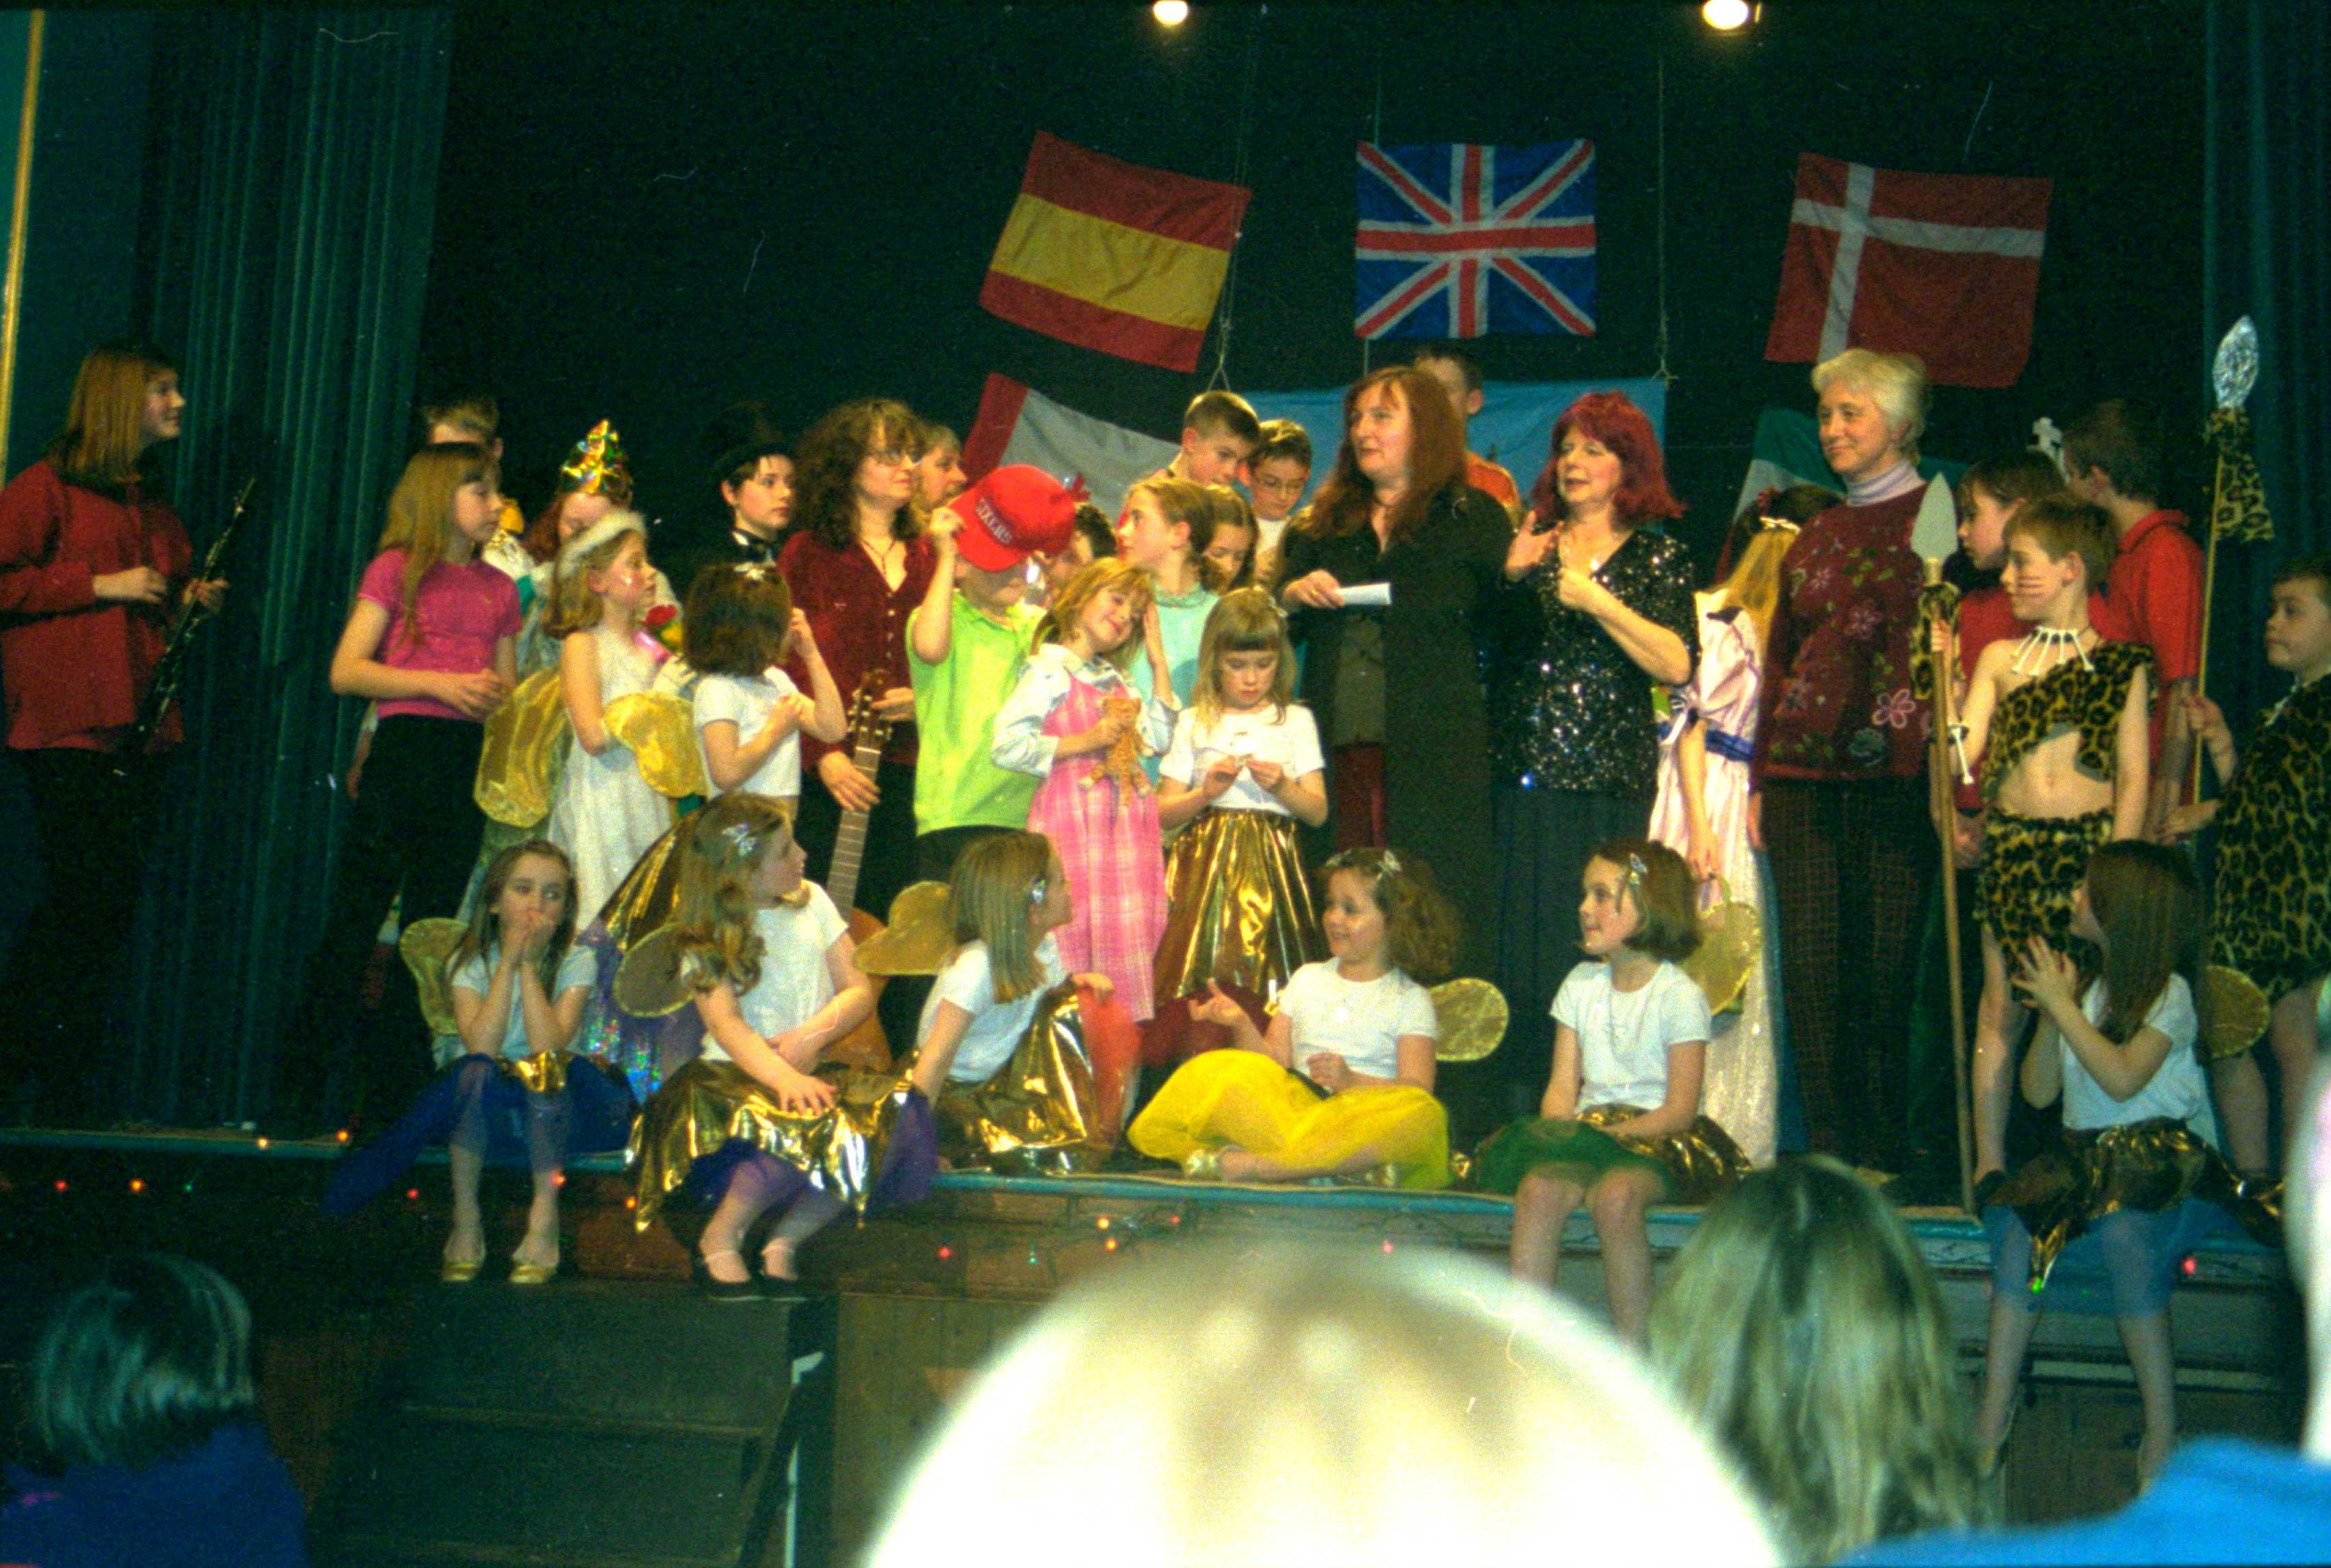 Millenium Show Jan 2000 From Jean Buckle